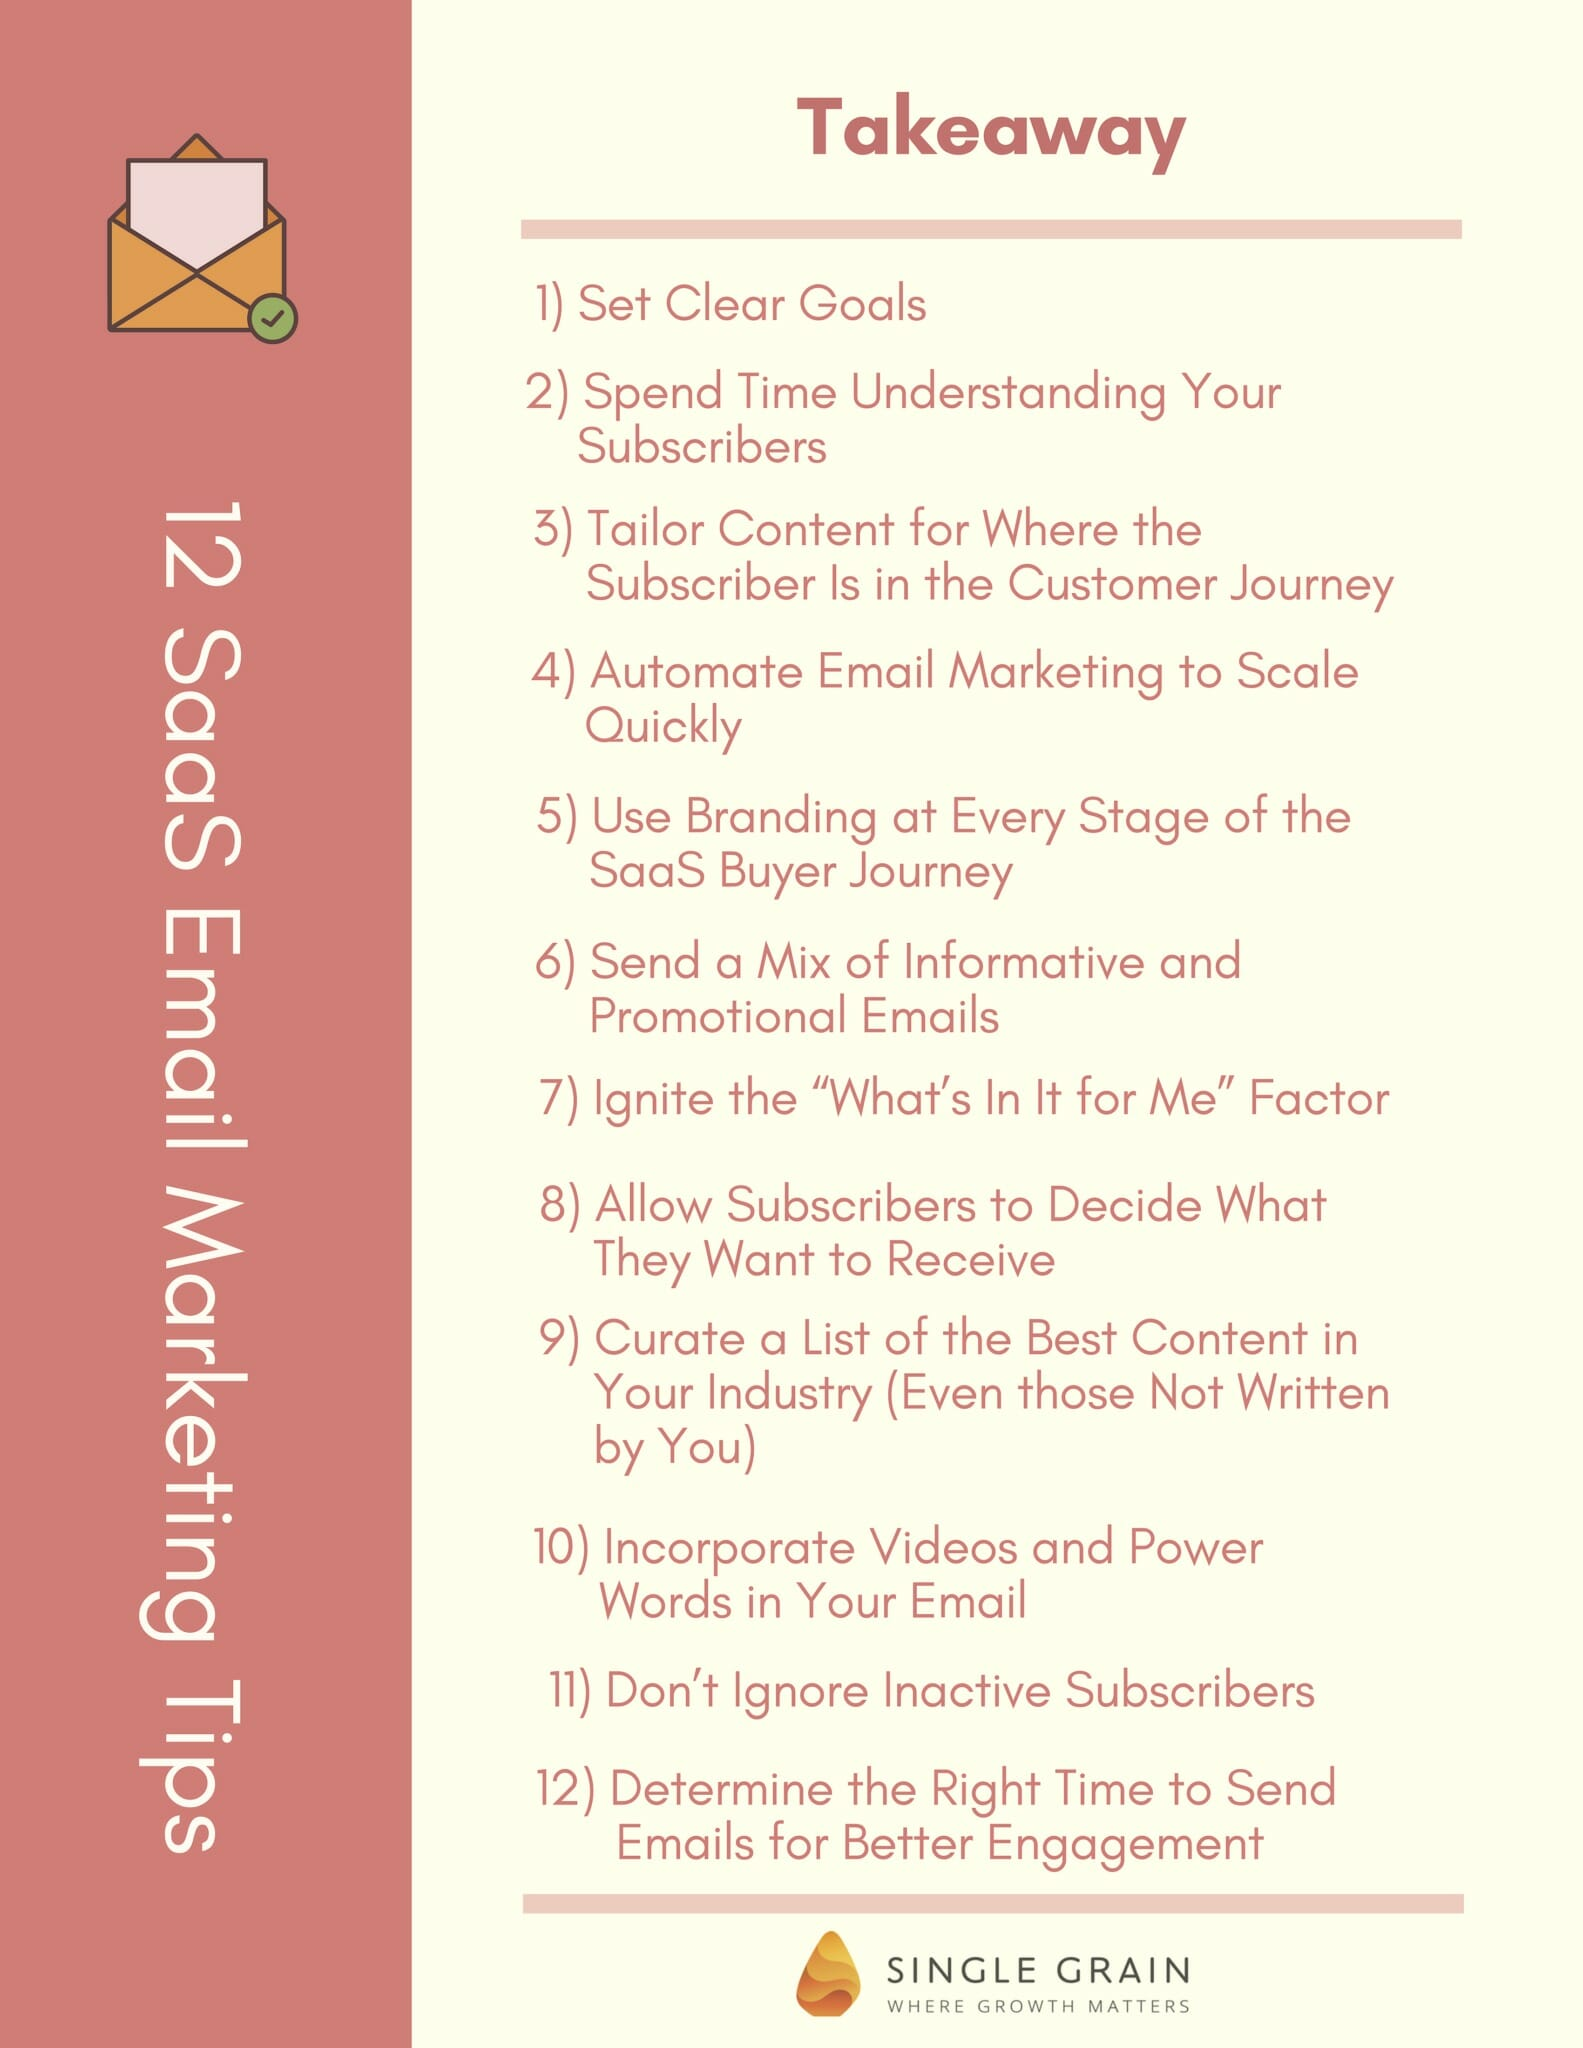 12 SaaS Email Marketing Tips - Single Grain